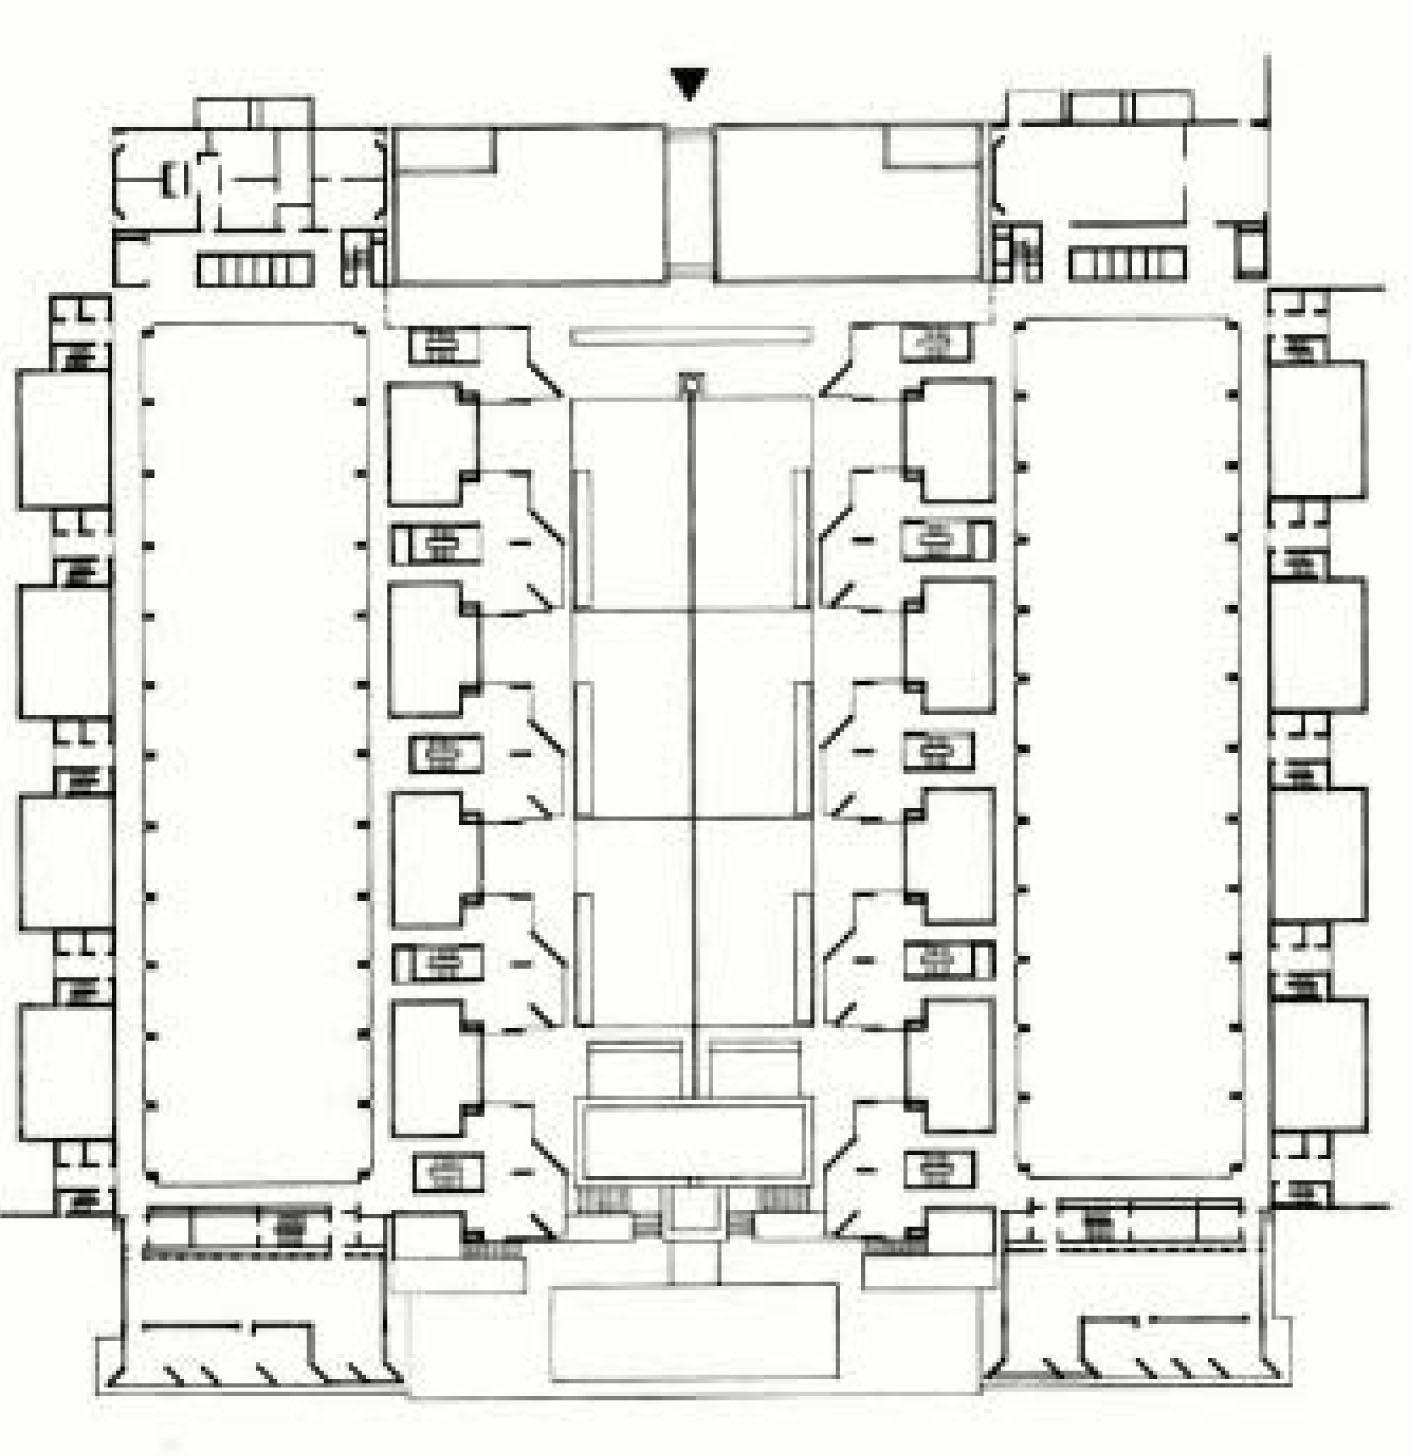 Louis Kahn, Salk Institute for Biological Studies, 1959-1965